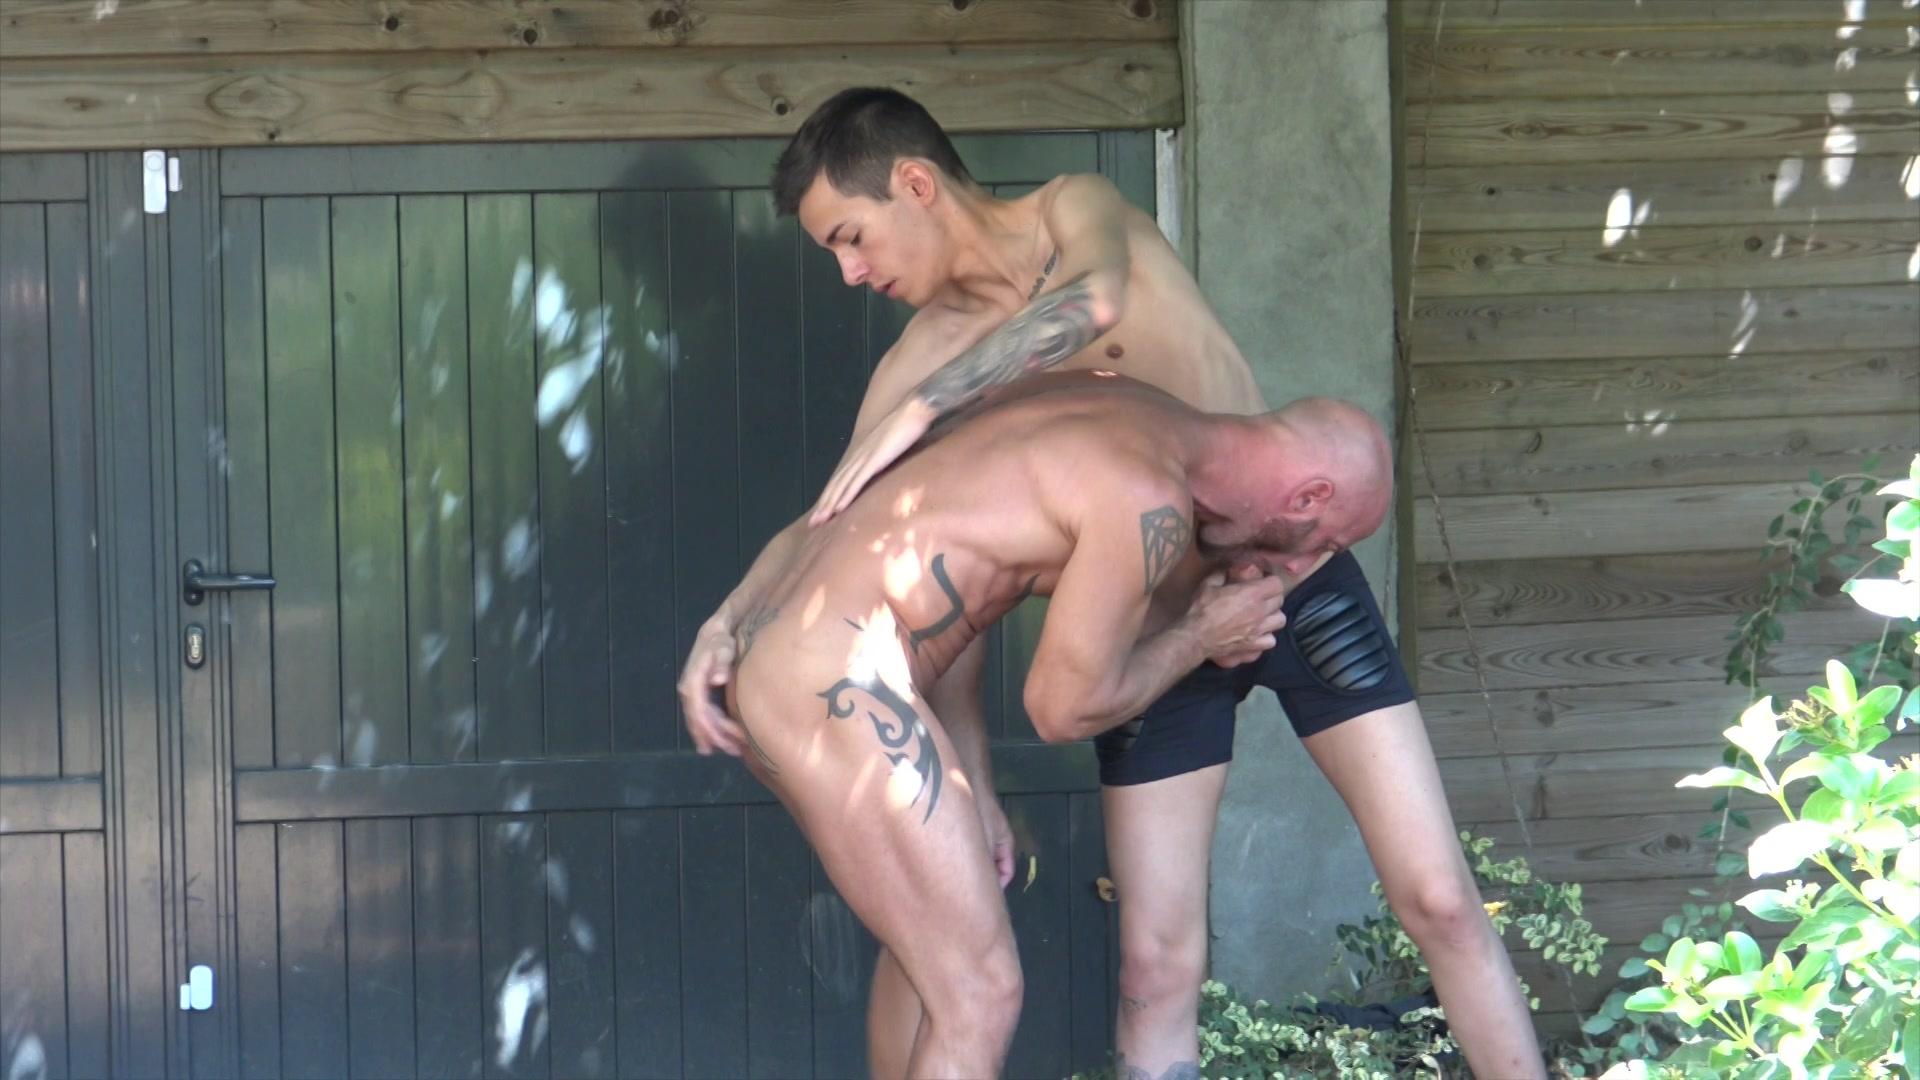 Aymeric Porn gay porn videos, dvds & sex toys @ gay dvd empire